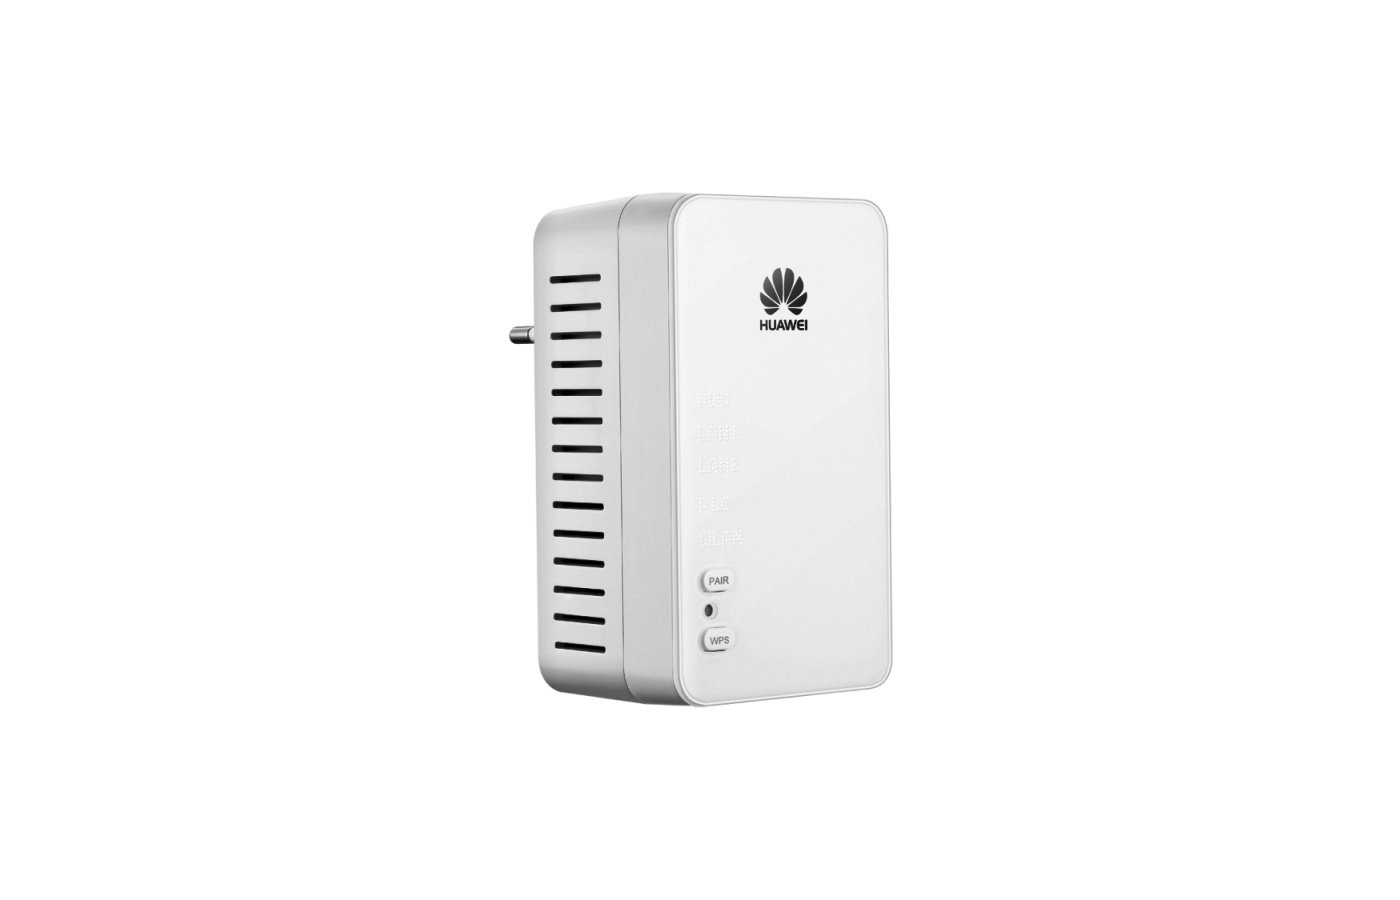 Сетевое оборудование Huawei PT530 Wi-Fi